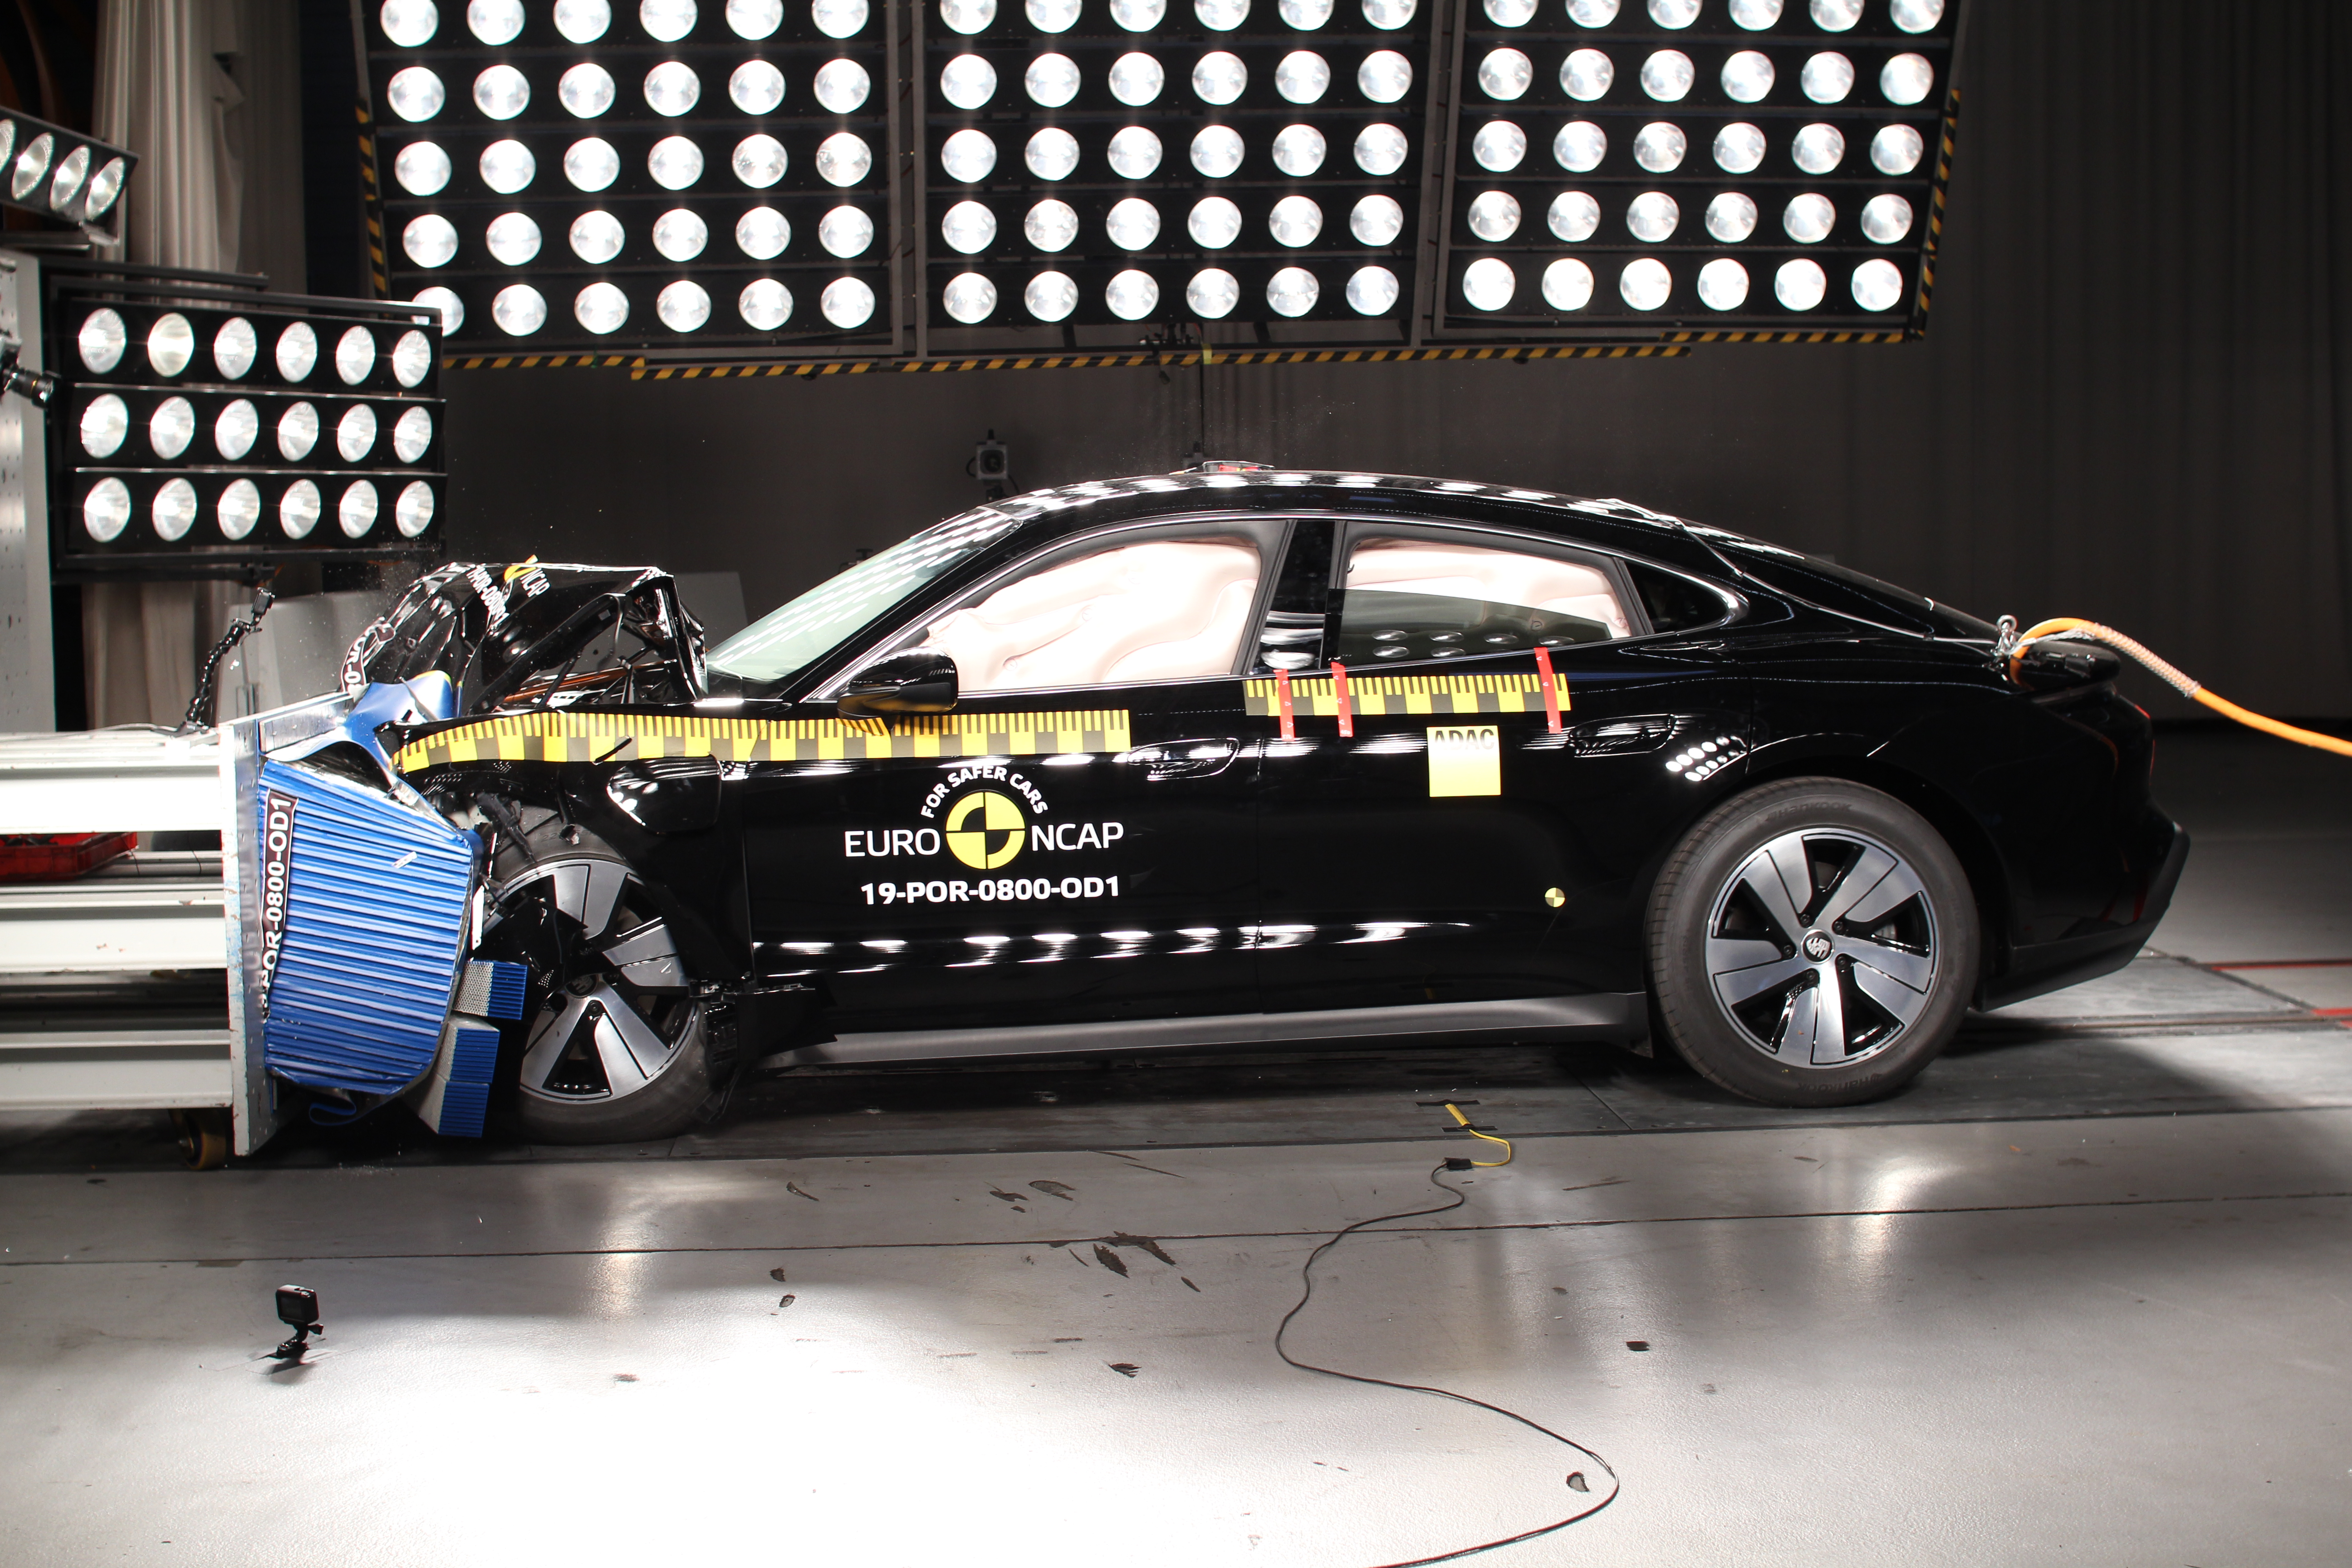 The Porsche Taycan also scored a full five stars